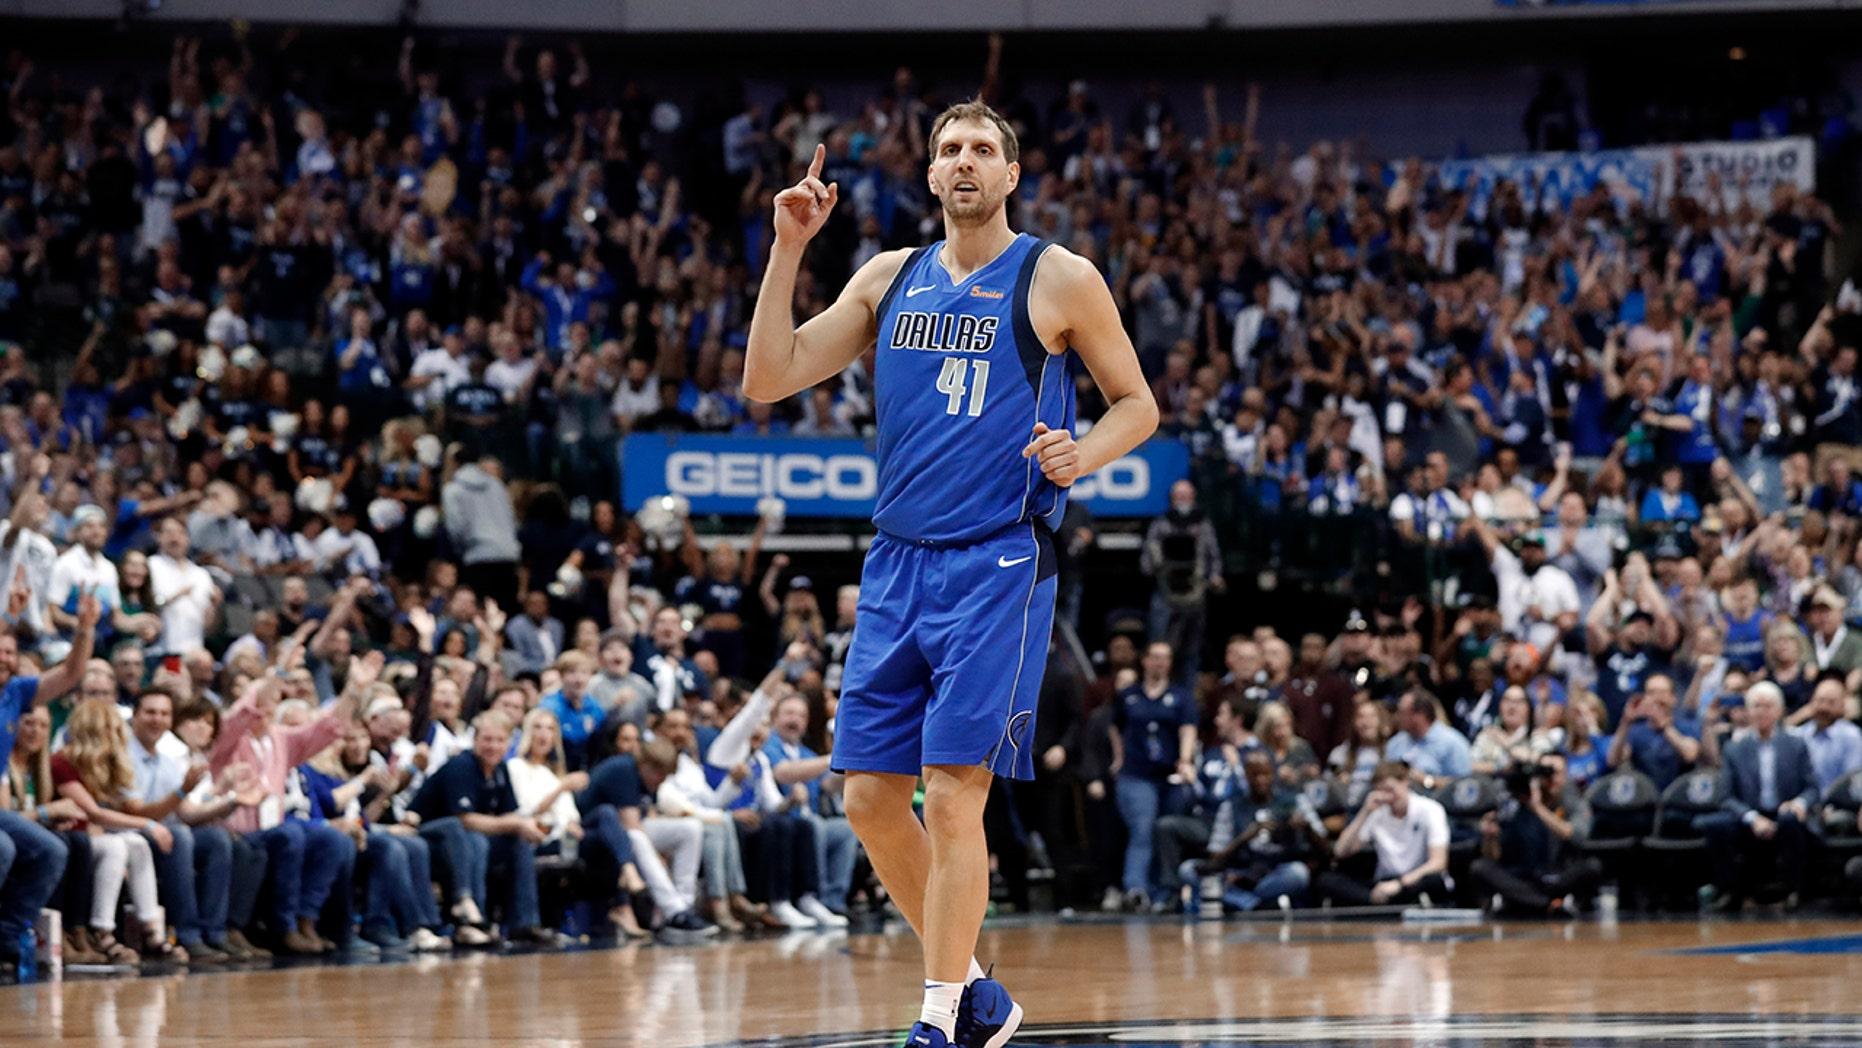 19f7f59f9 Dallas Mavericks  Dirk Nowitzki (41) celebrates sinking a 3-point basket  during